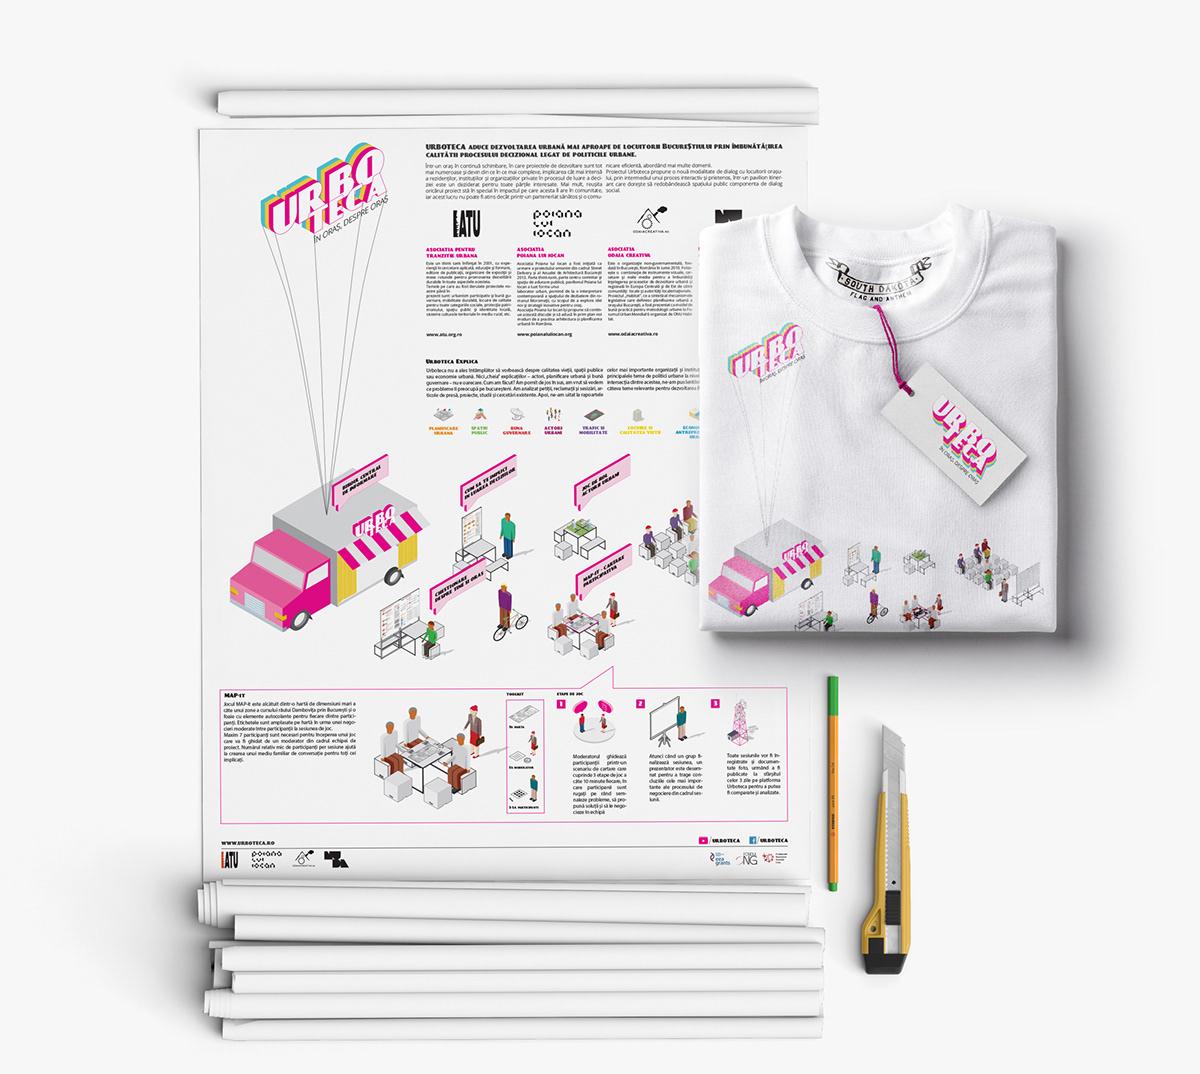 public participation pop-up pavilion adobe illustrator Isometric urban planning city Web Design